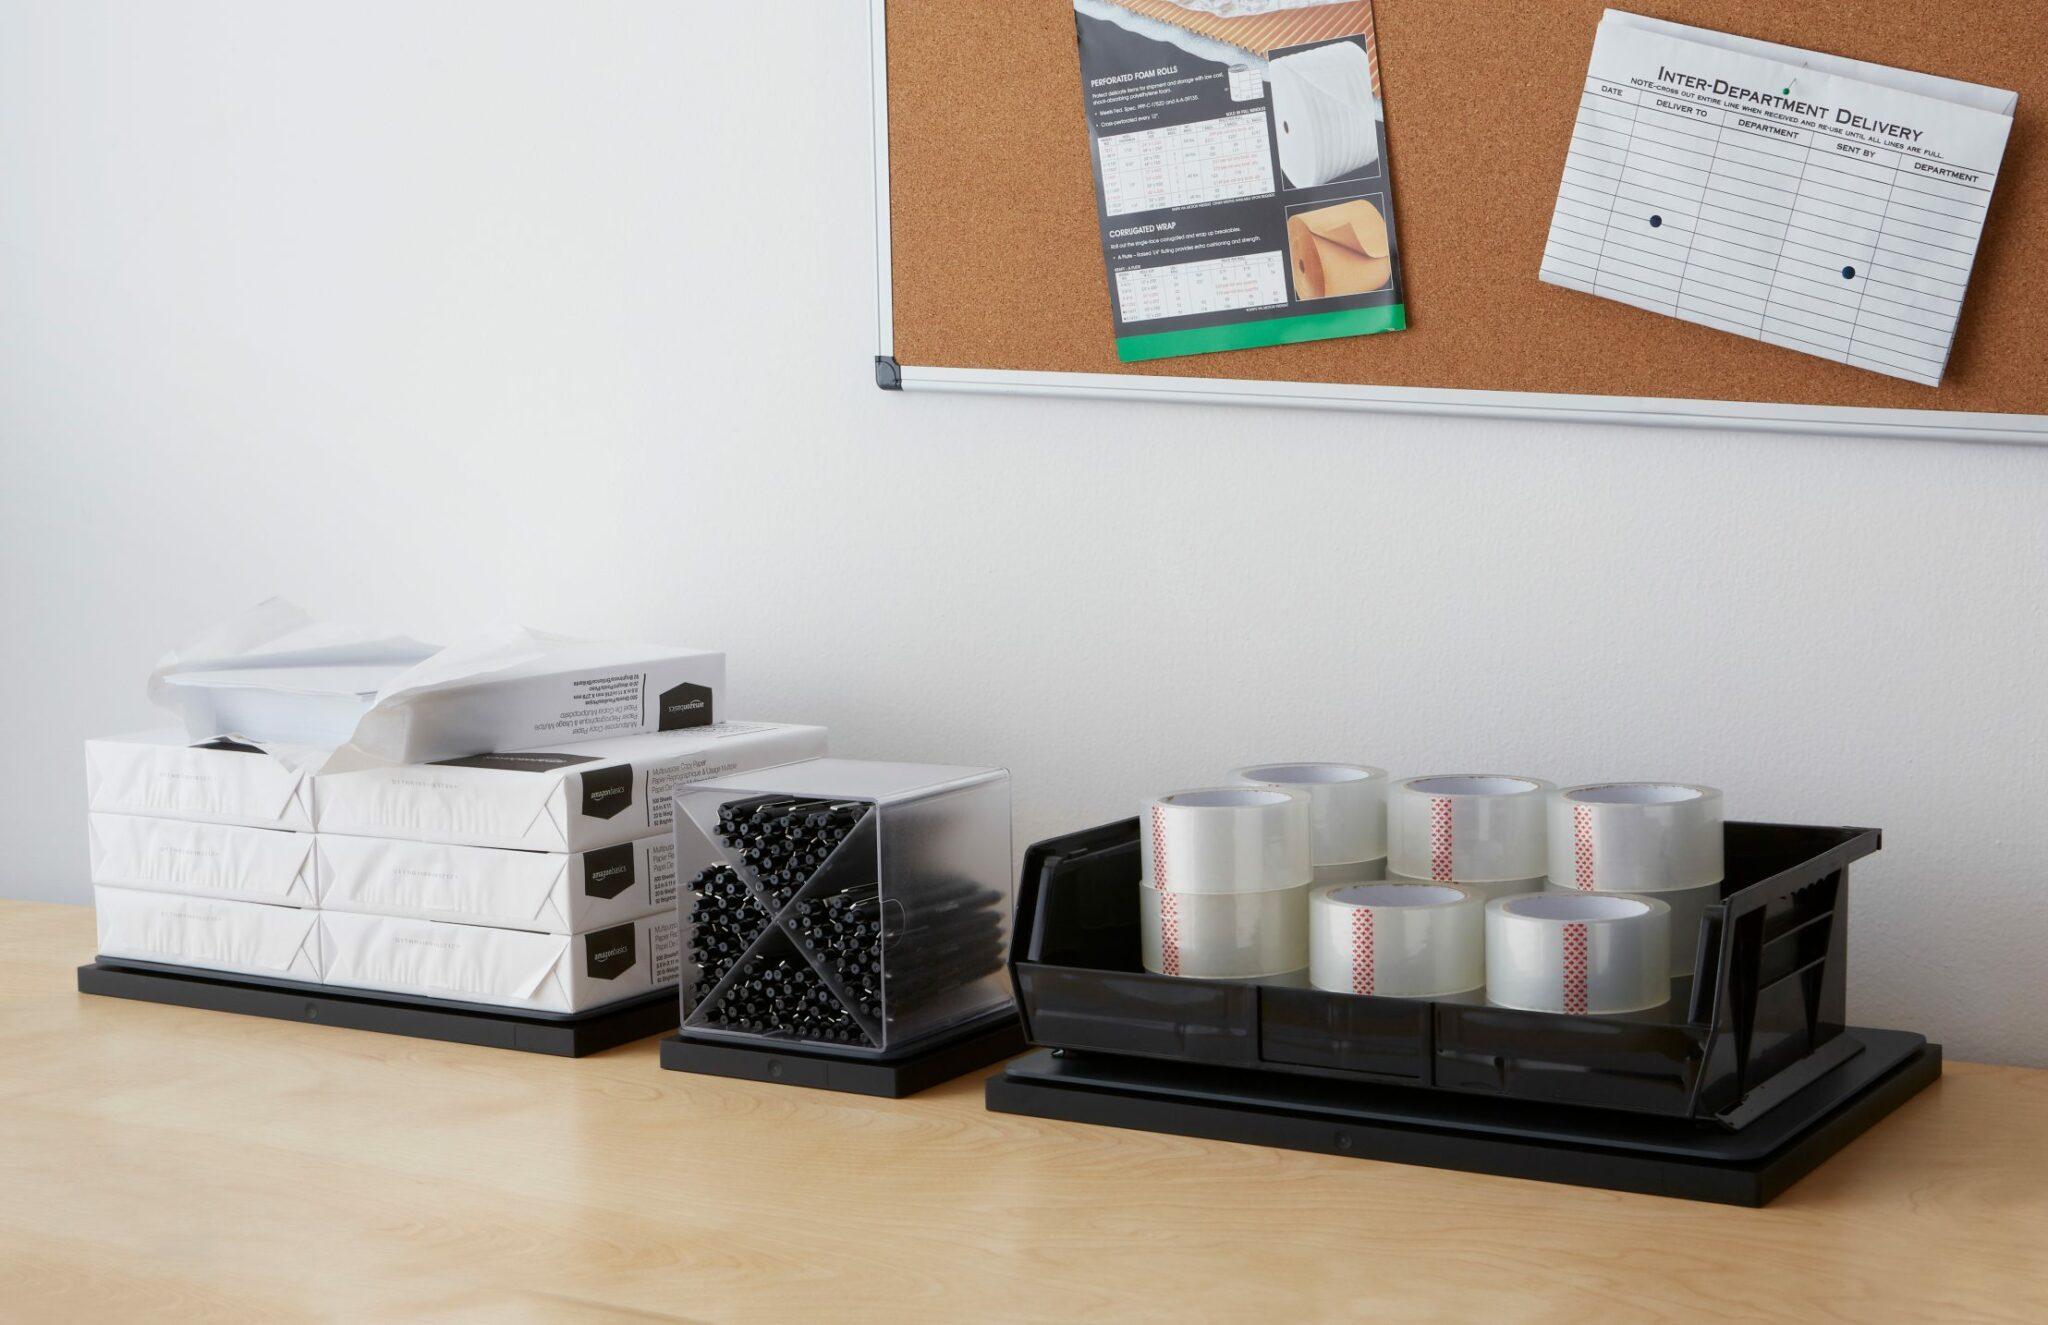 Robo-commerce: Amazon's auto-reordering Dash Smart Shelf goes on sale for $19.99